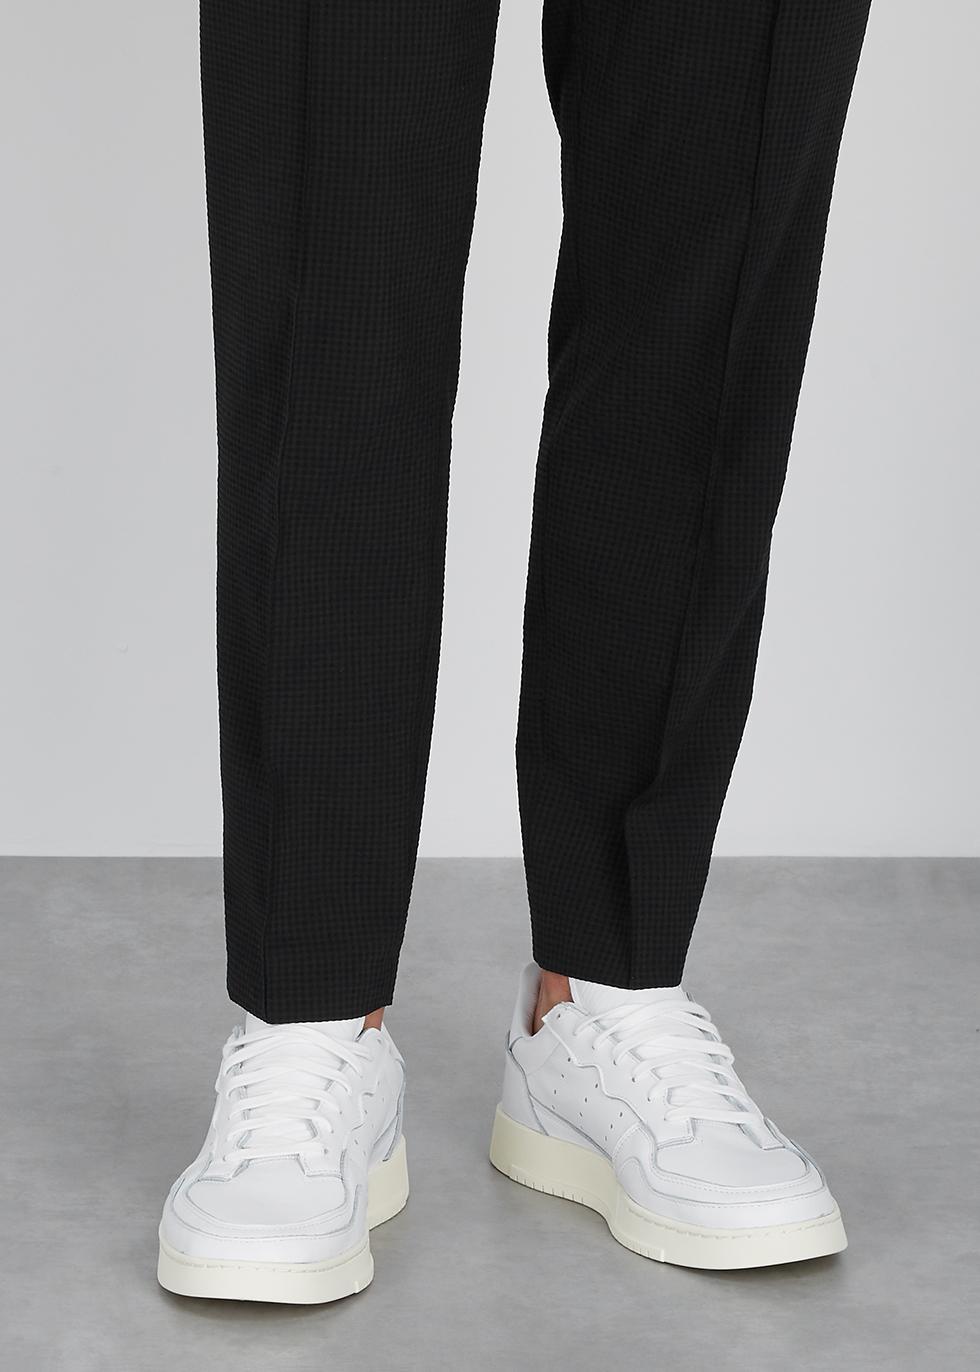 adidas Originals Supercourt white leather sneakers Harvey